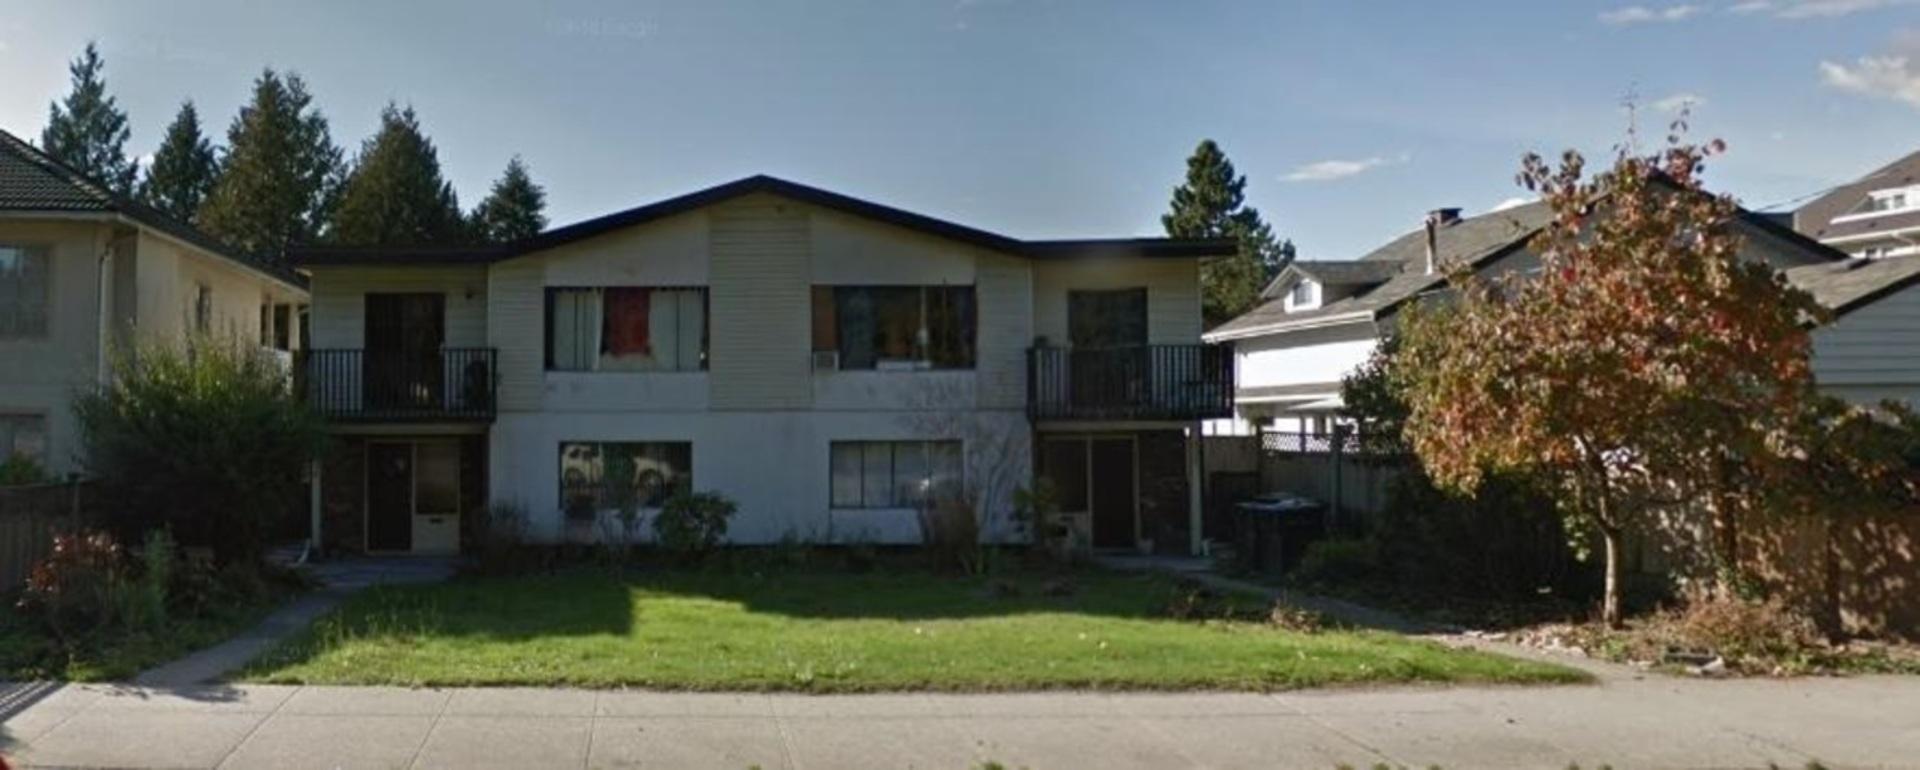 3137 Coast Meridian Road, Glenwood PQ, Port Coquitlam